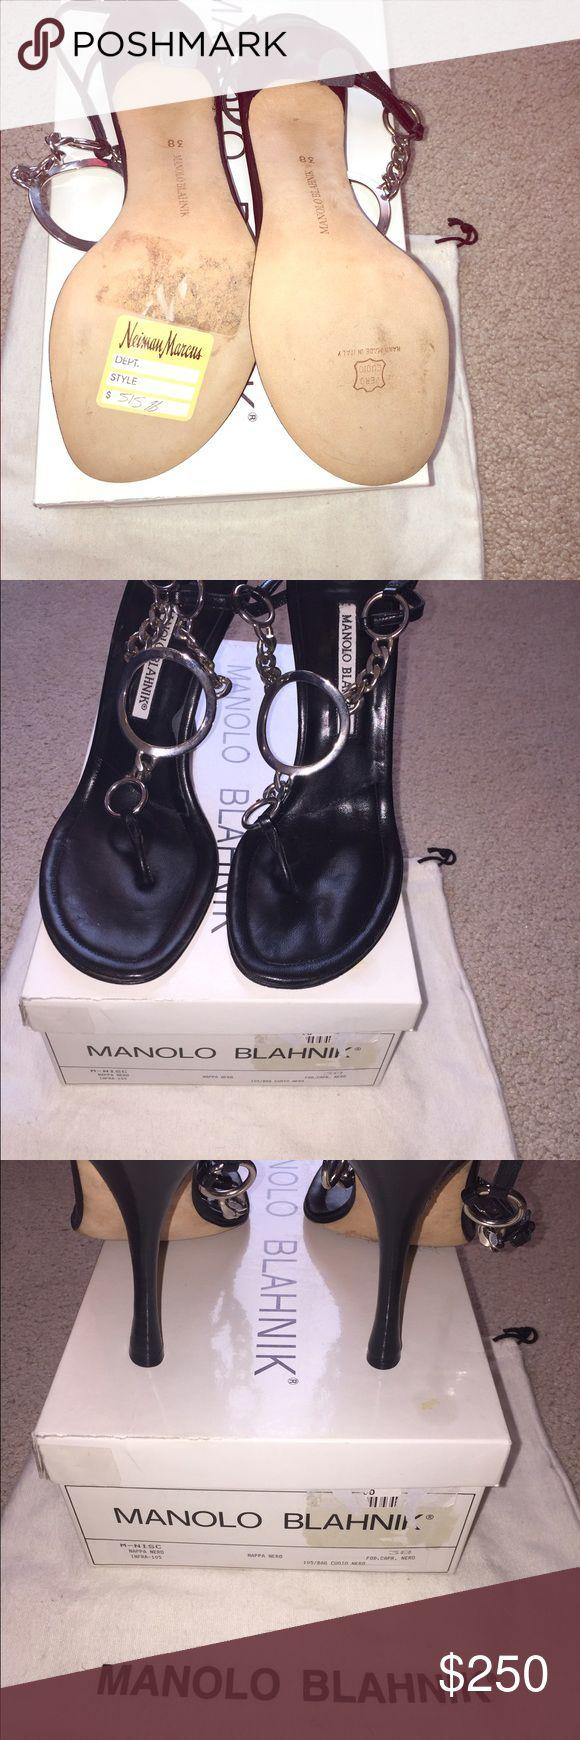 Black dress Manolo Blahnik sandal. NWT runs small Sexy sandal by Manolo Blahnik. NWT fits like 7 1/2 box and bag included. No trades please Manolo Blahnik Shoes Heels